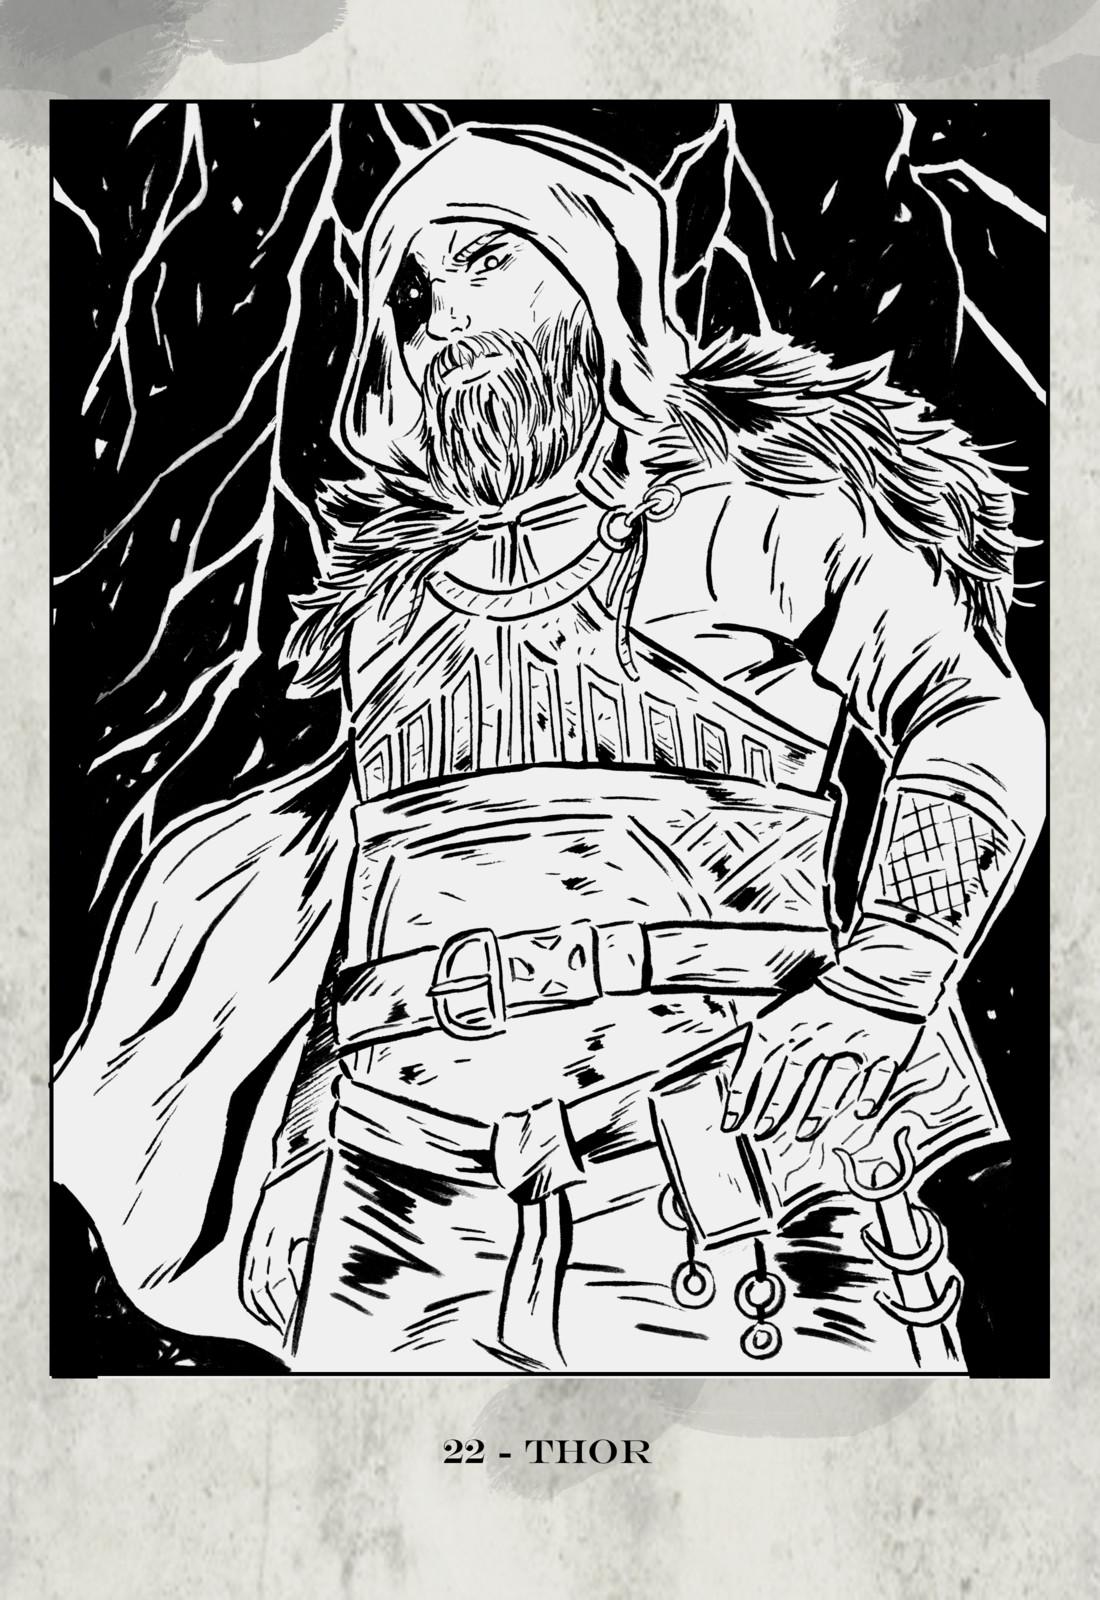 22 - Thor